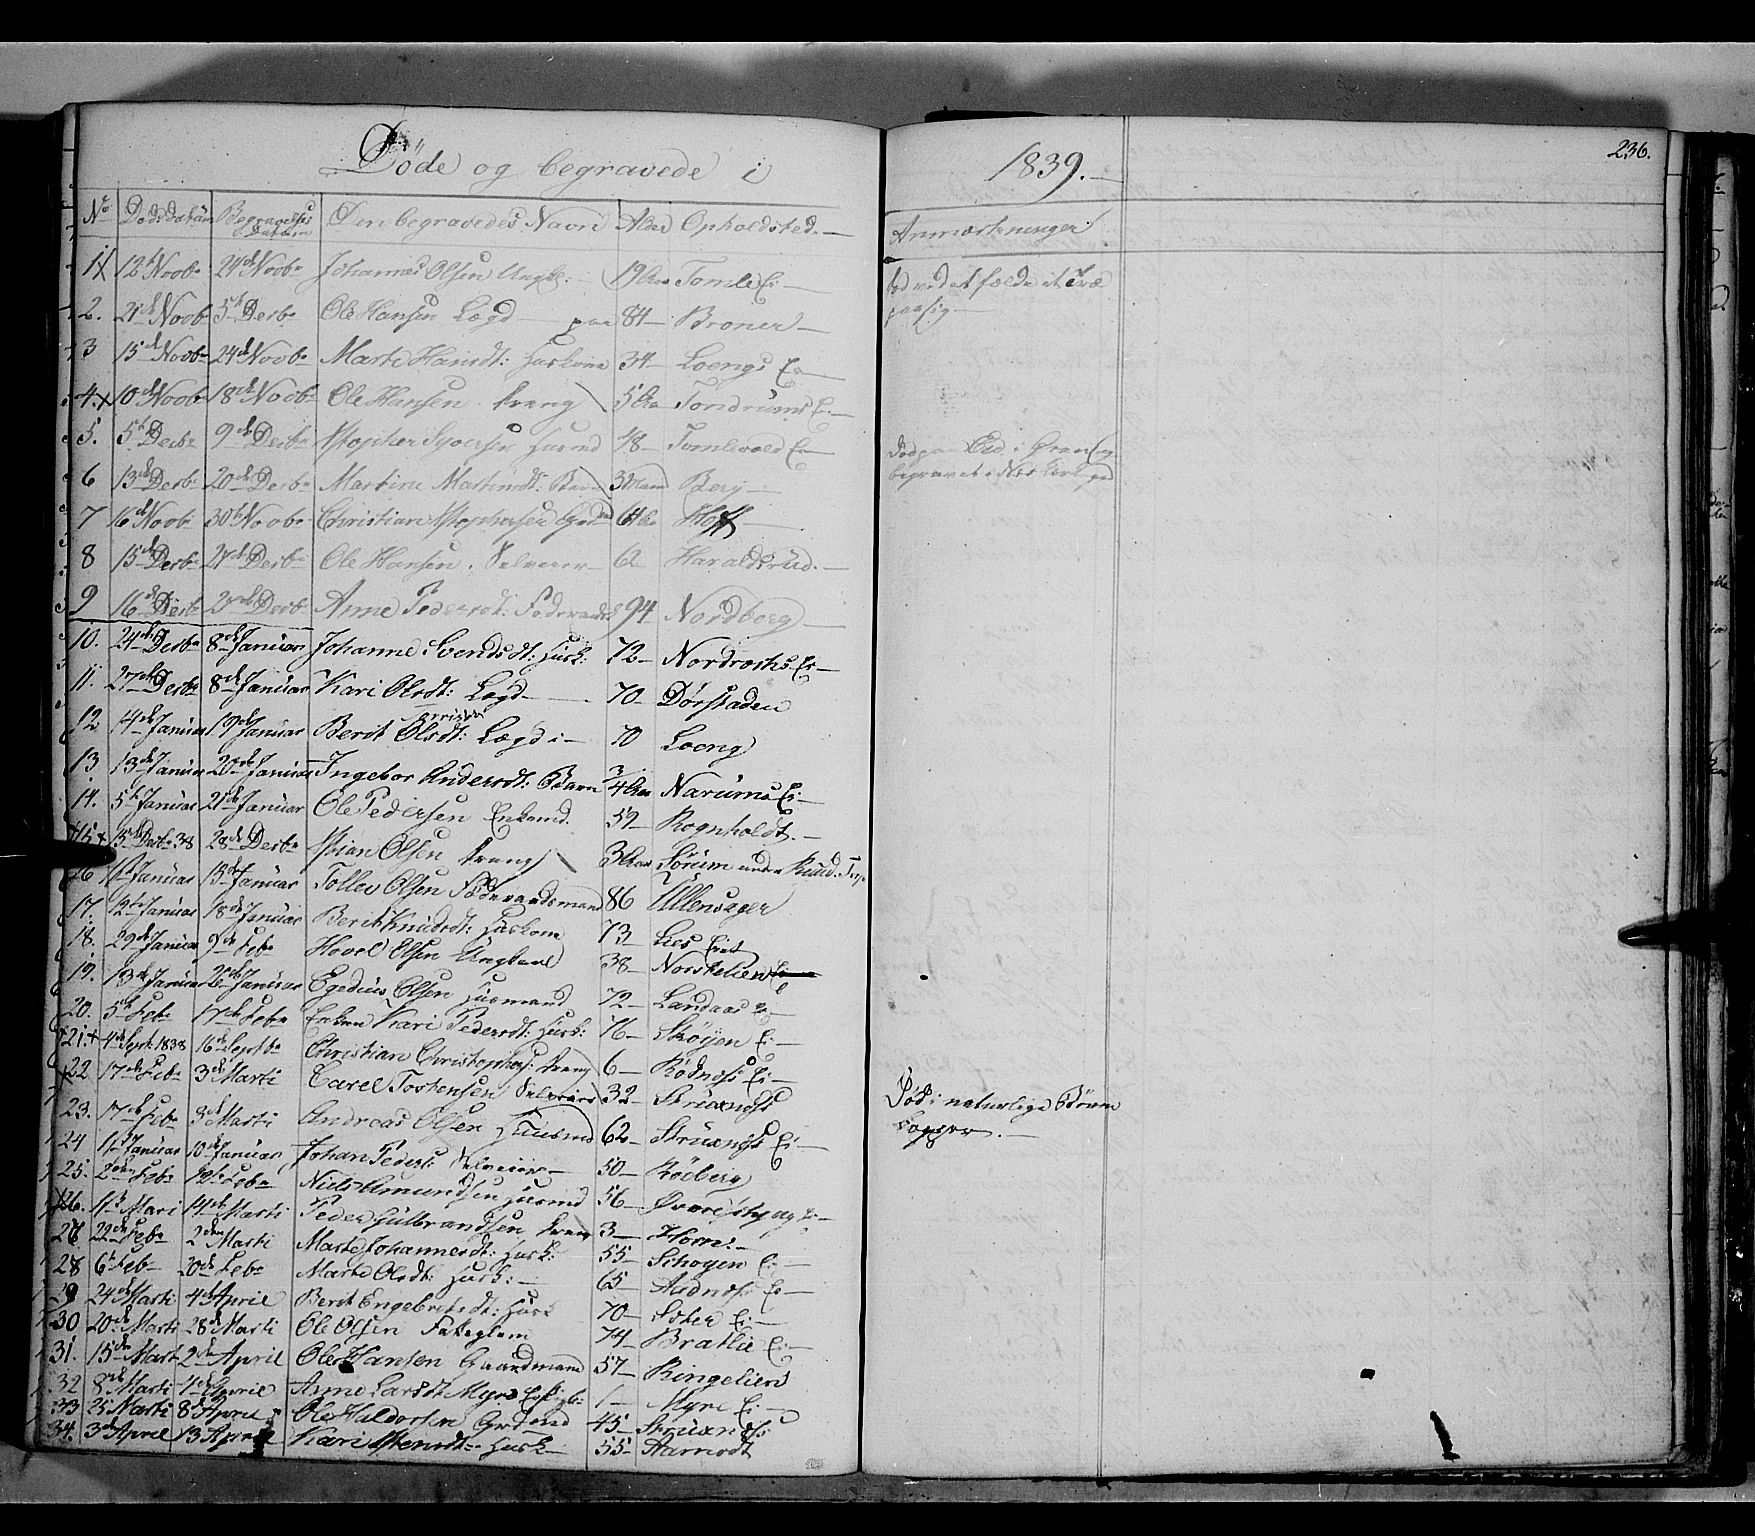 SAH, Land prestekontor, Klokkerbok nr. 2, 1833-1849, s. 236